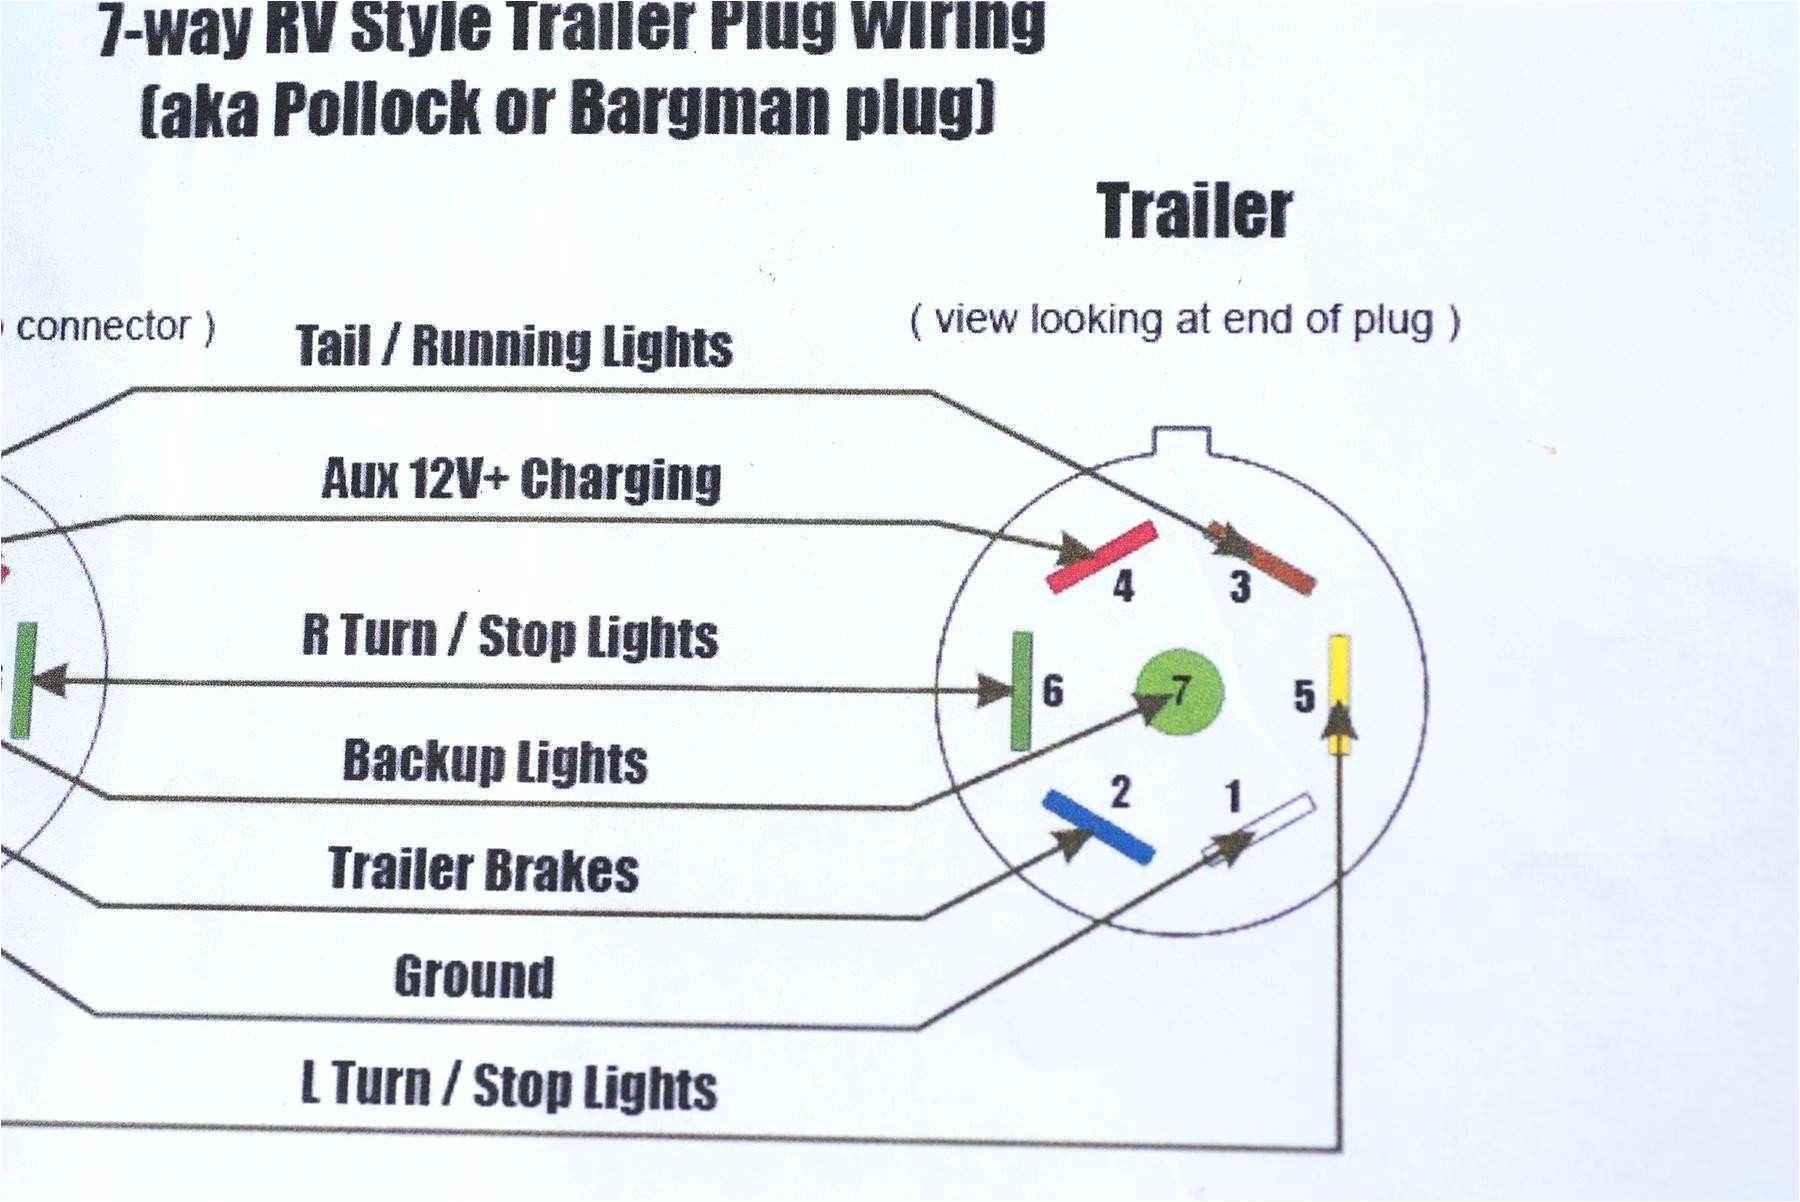 6 pole trailer wiring diagram wiring diagram ame 6 pin square trailer connector wiring diagram 6 pole square trailer plug wiring diagram